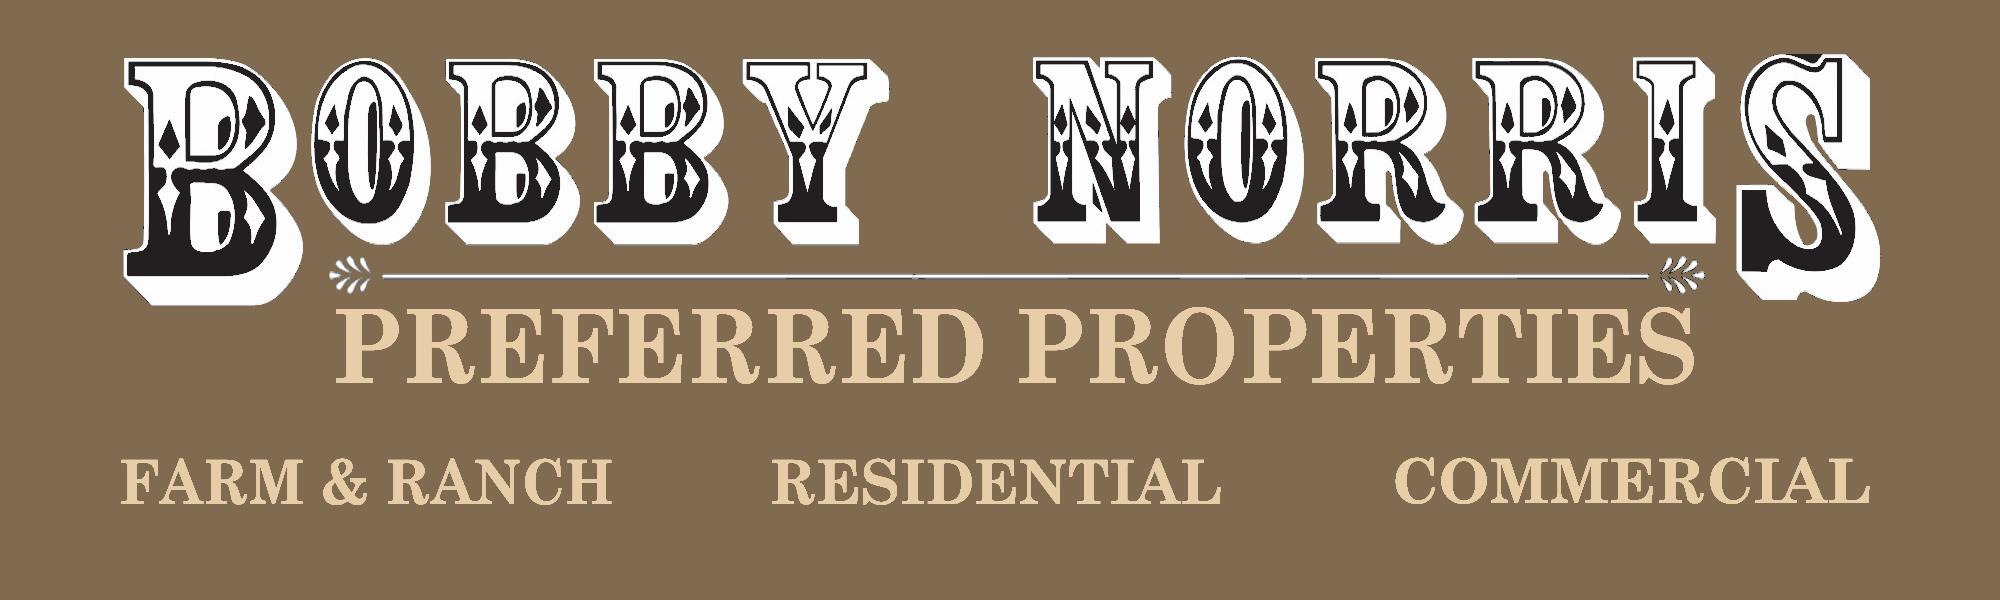 Bobby Norris Preferred Properties